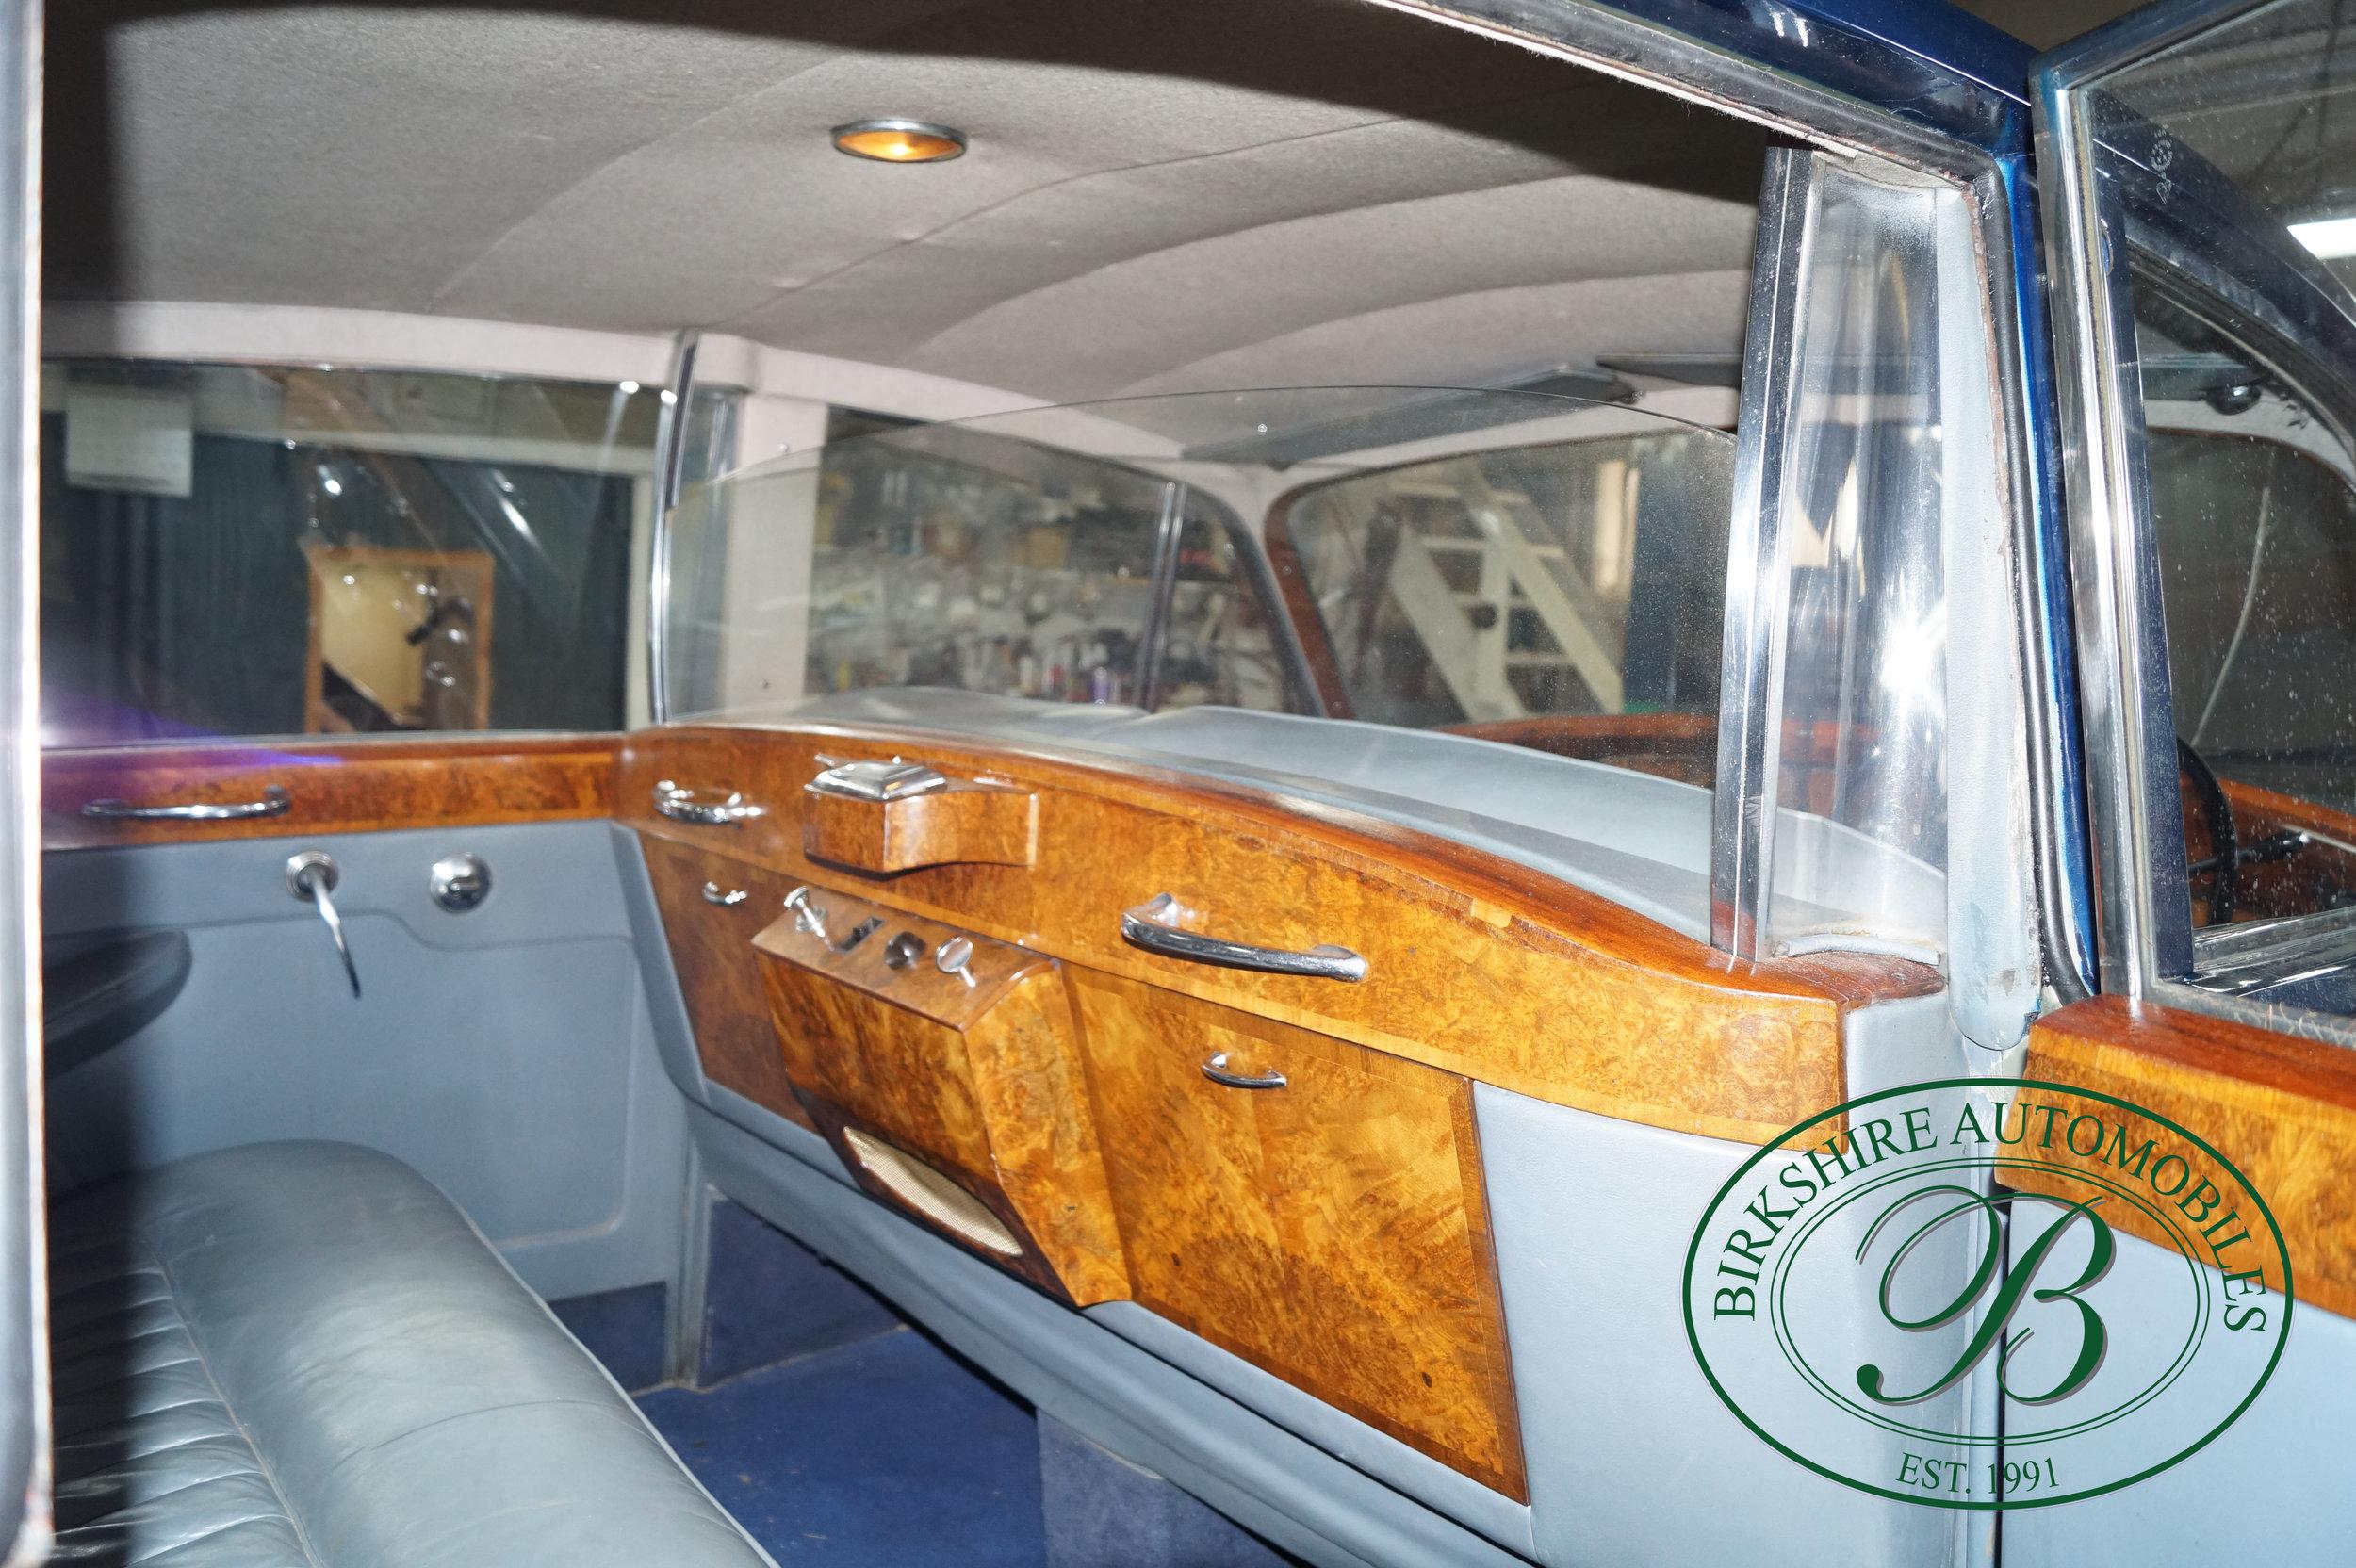 Birkshire Automobiles 1960 Rolls Royce Silver Cloud-41.jpg